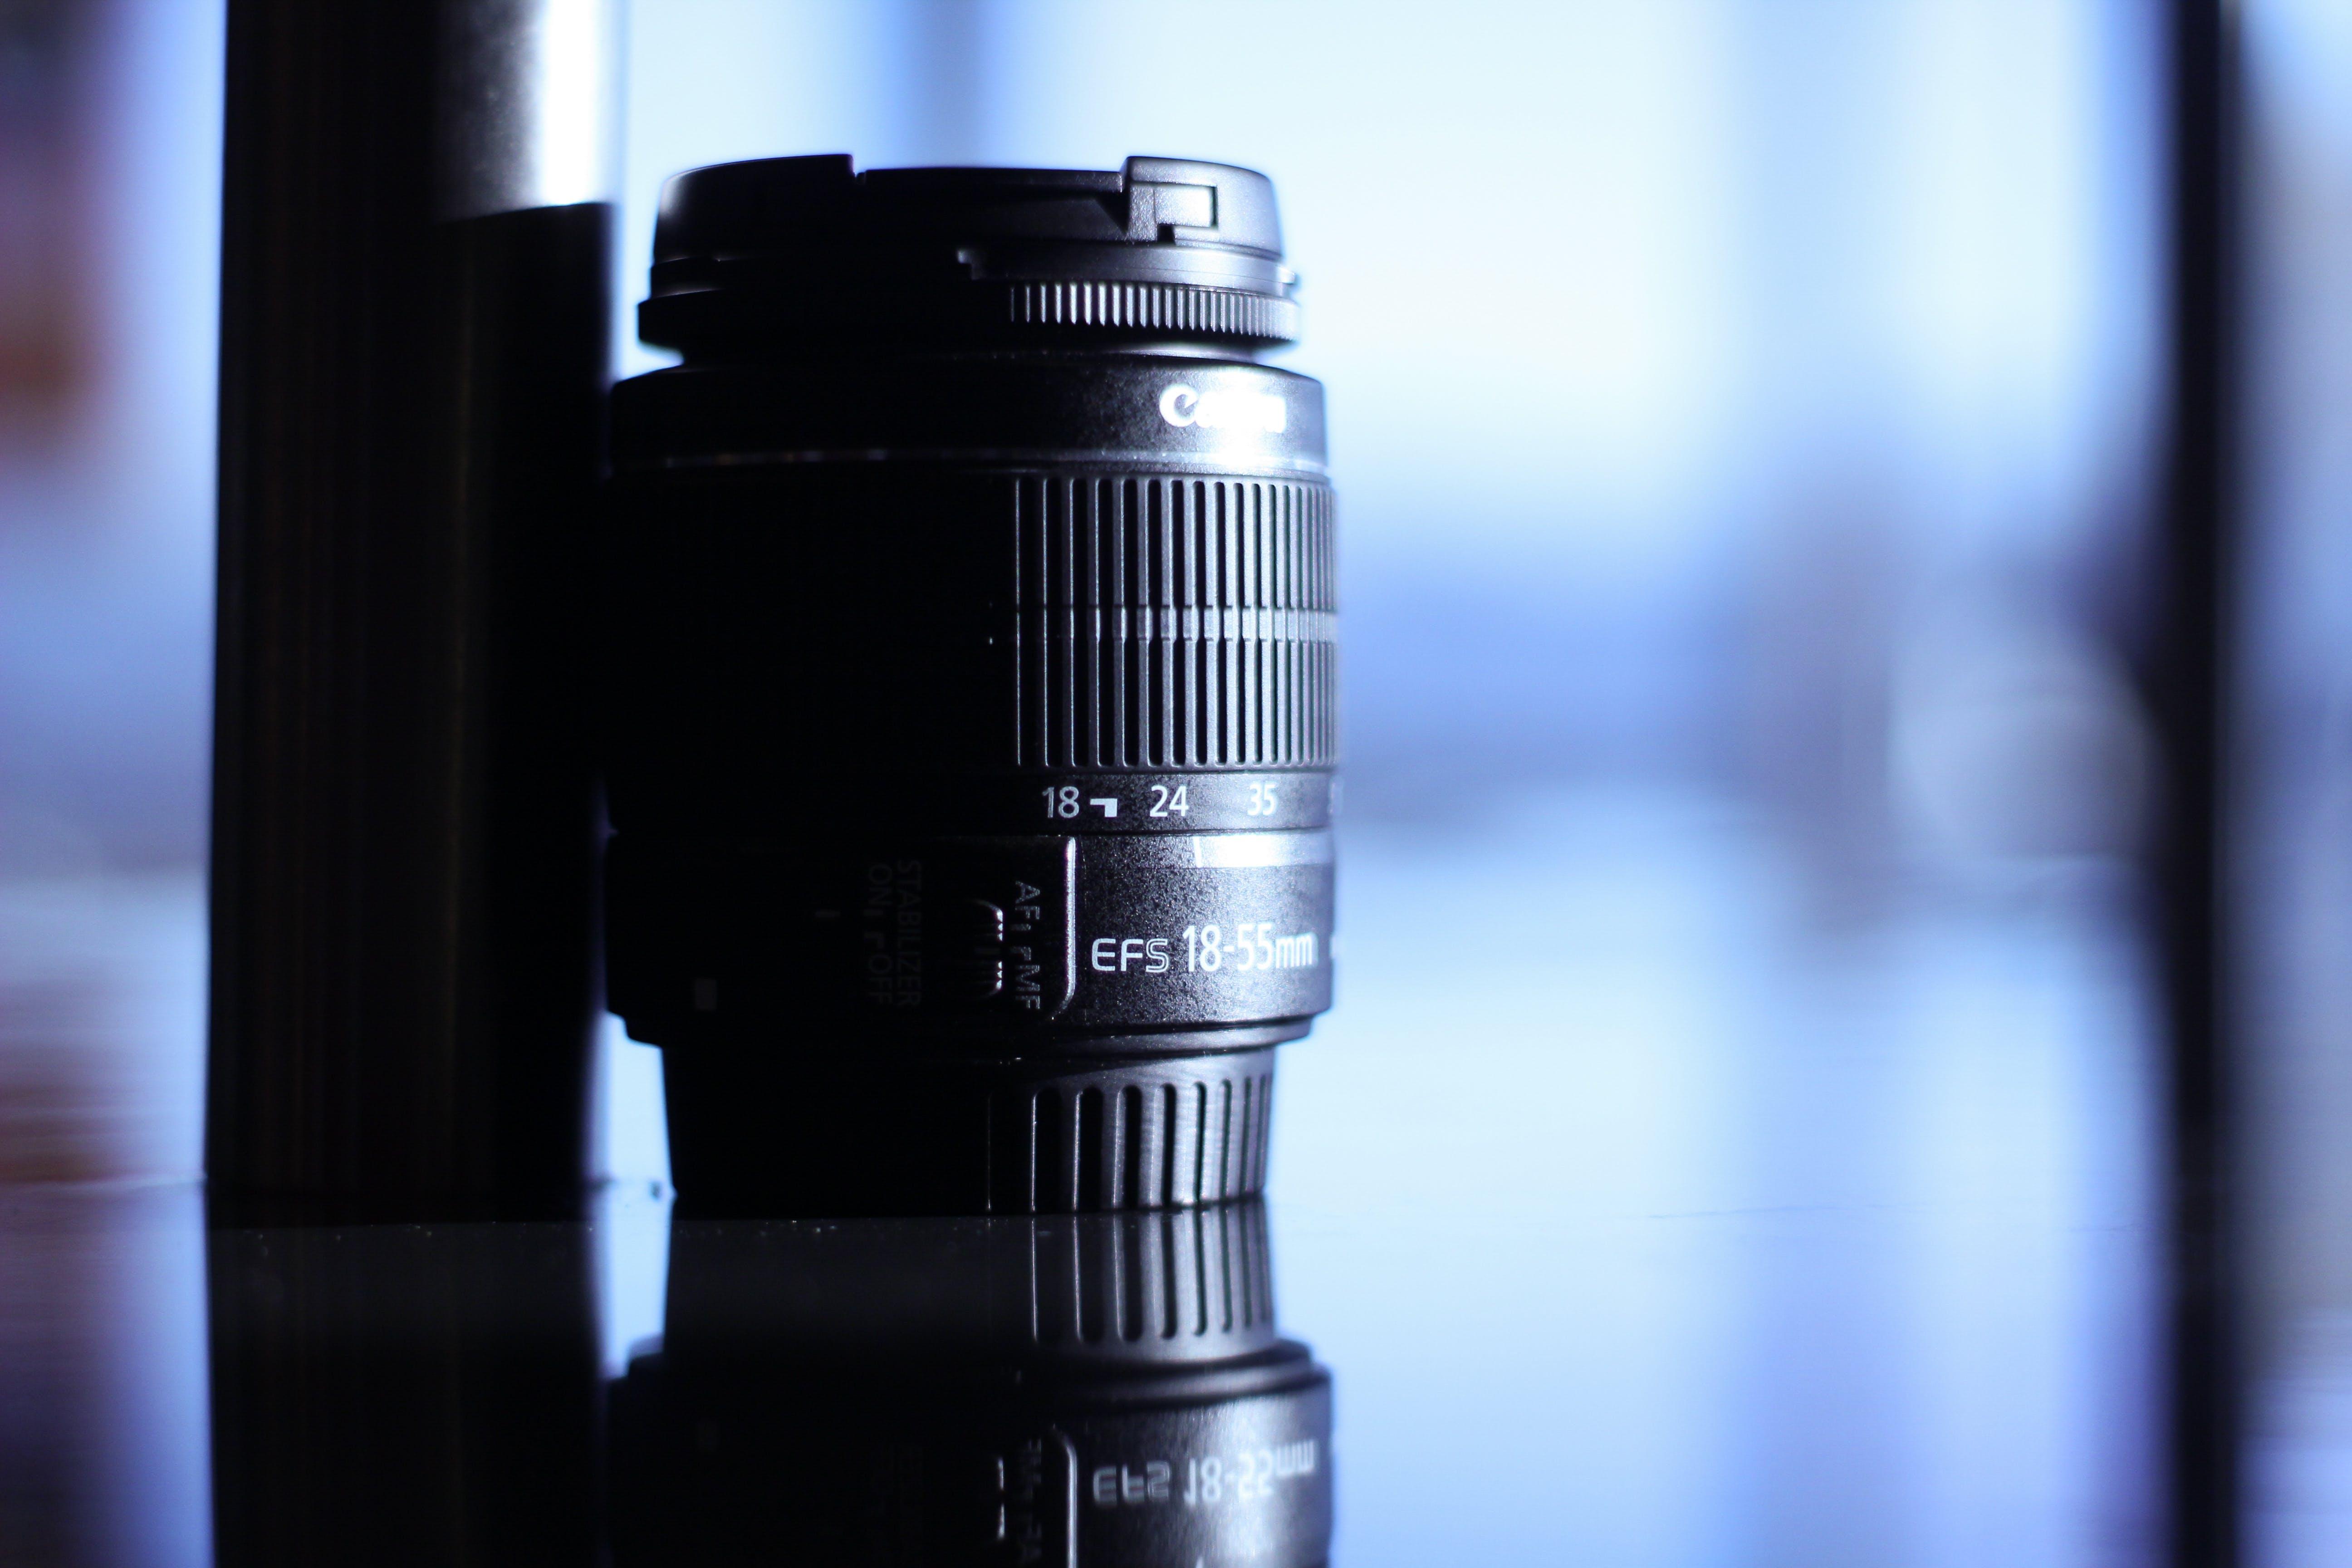 Tilt Lens Photography of Black Camera Lens